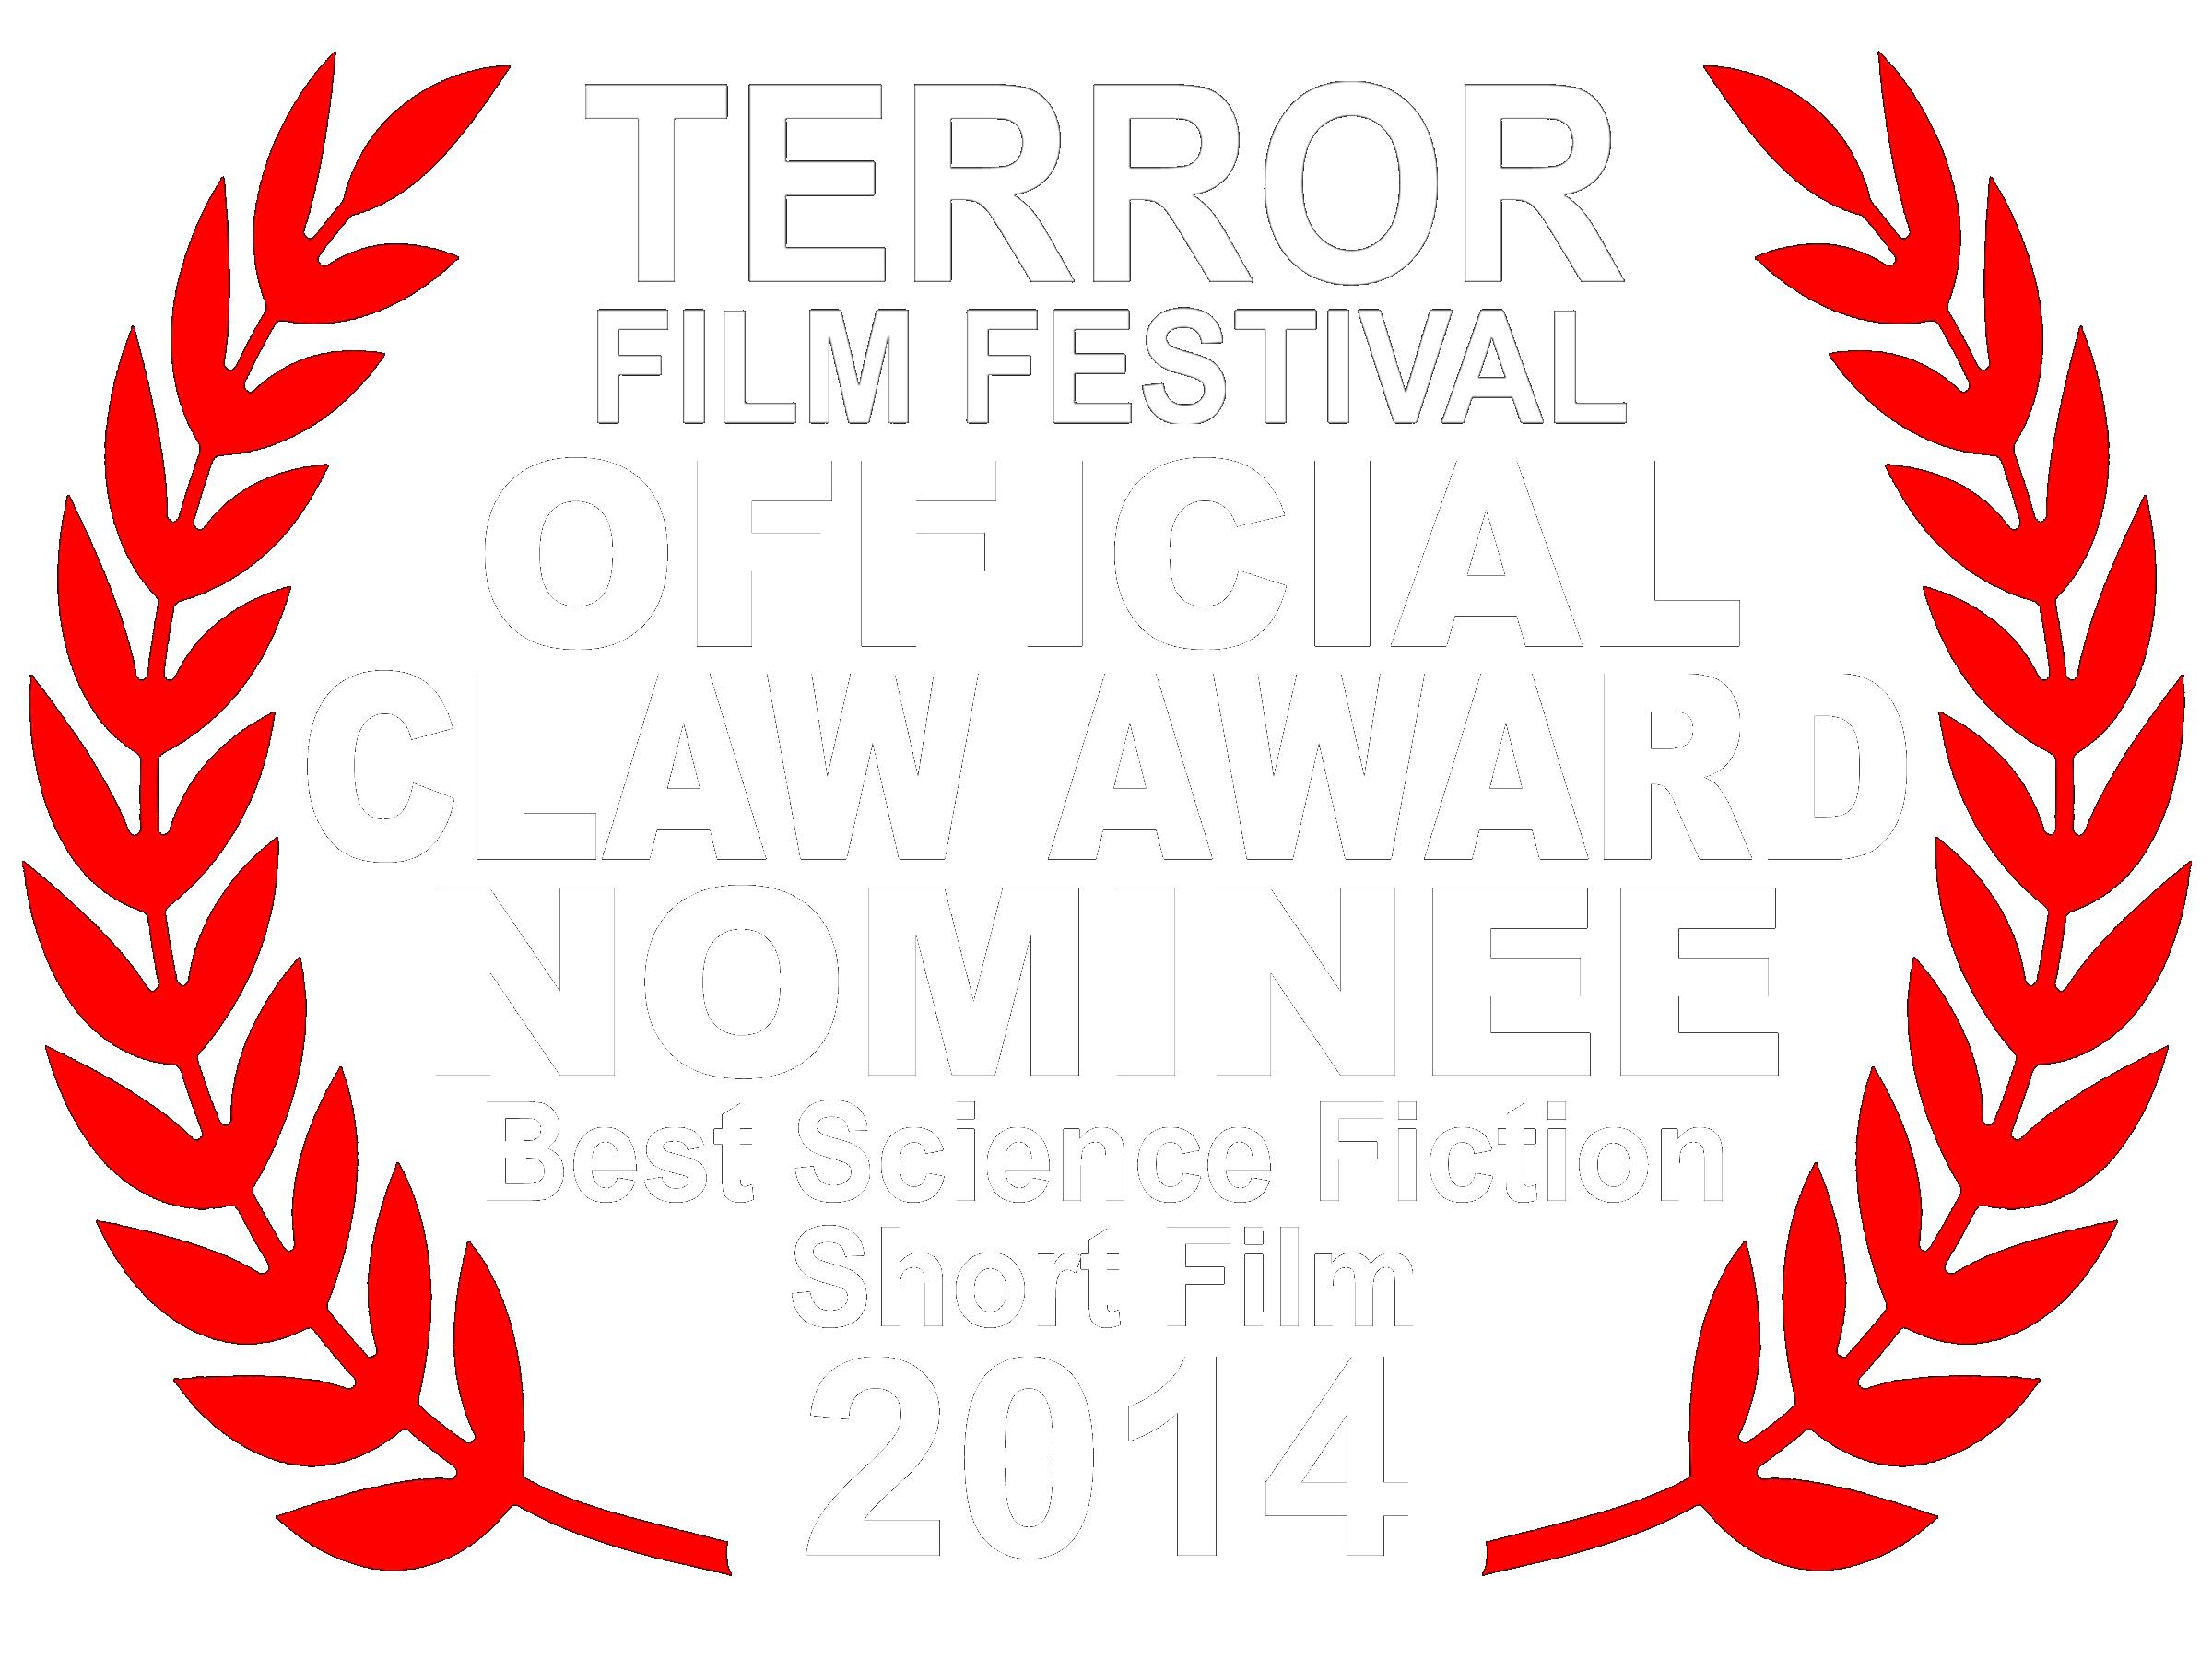 TerrorFilmFestival2014 Nominee Sci-fi Final.png